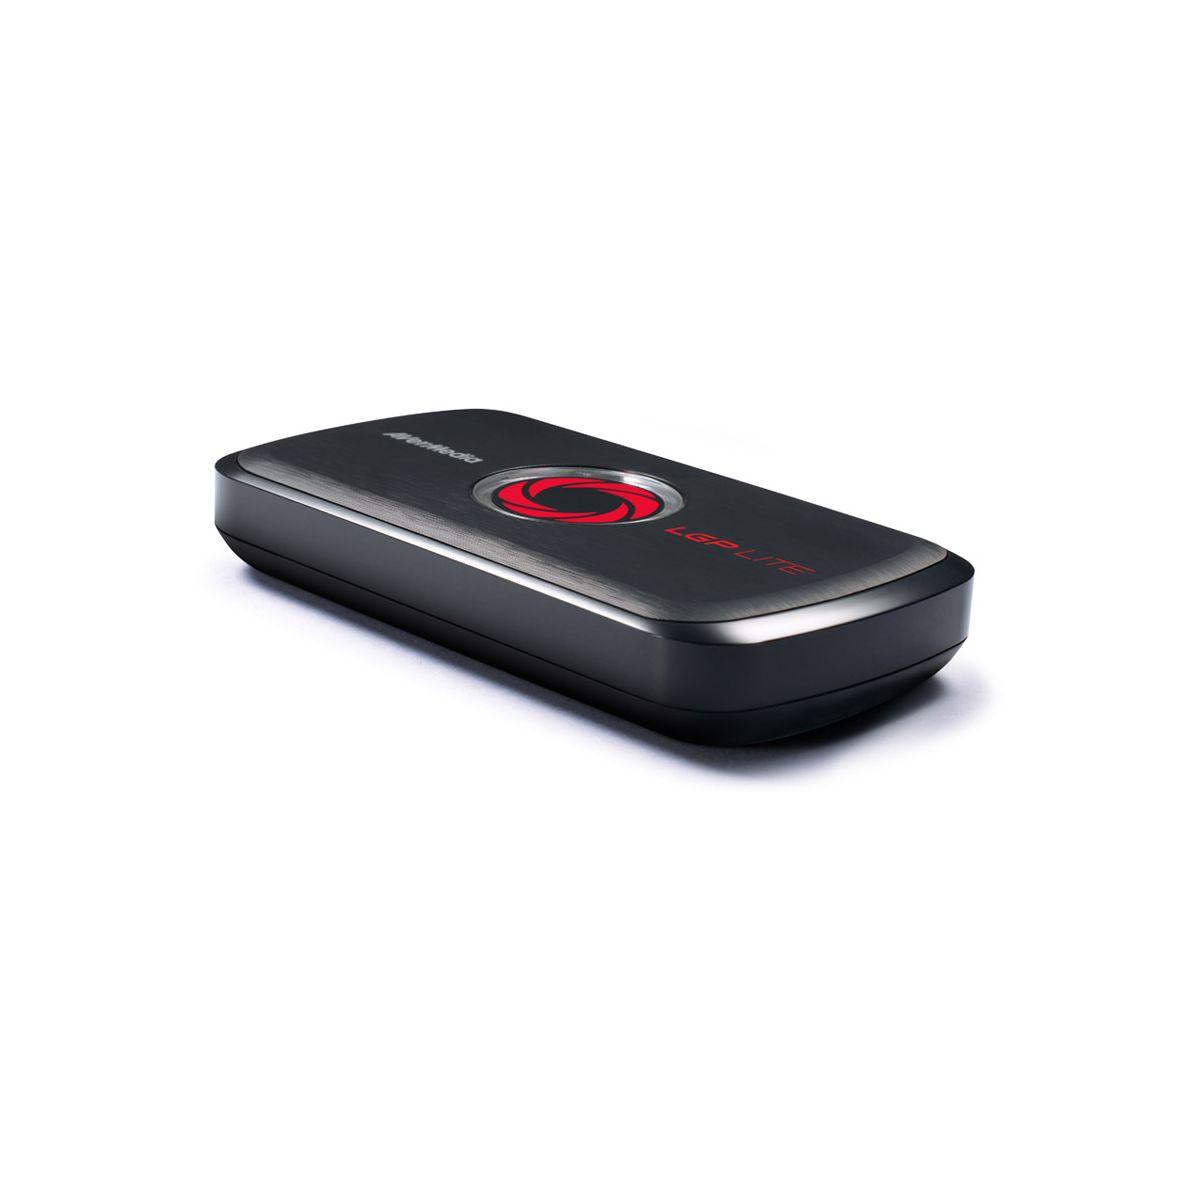 Carte AVERMEDIA GL310 Lite Livegamer portable